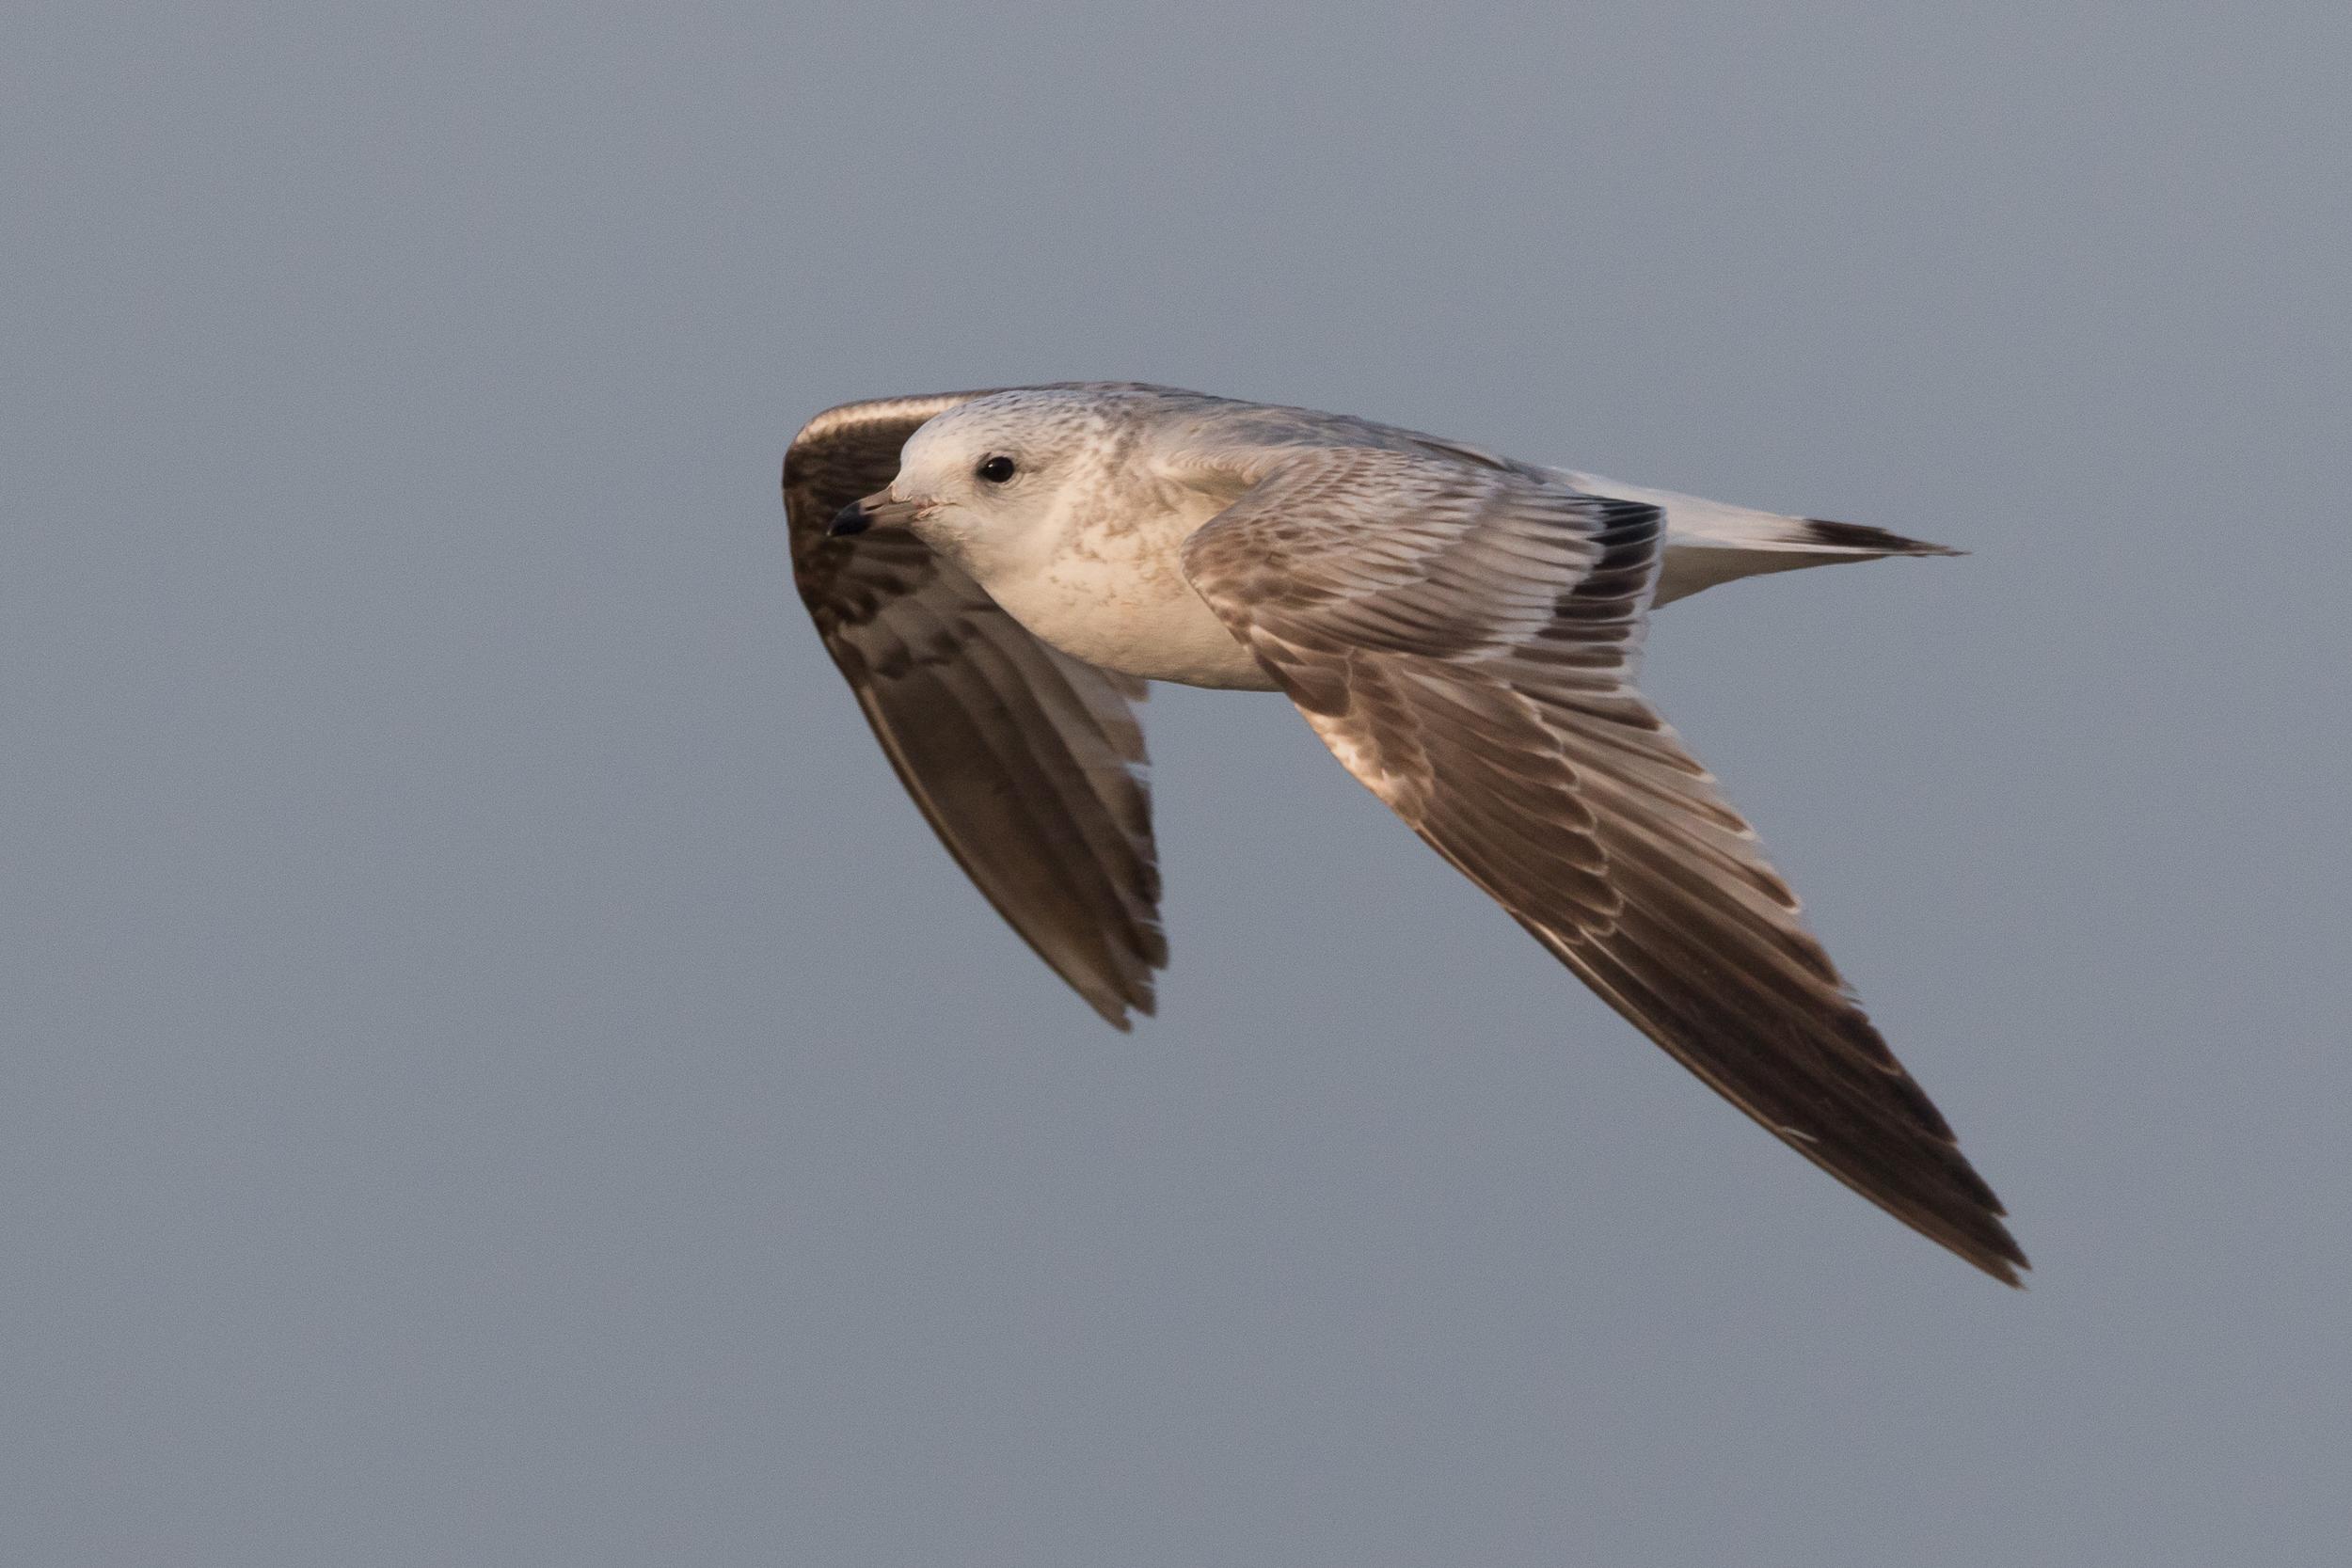 20170126-Common Gull 2CY-33.jpg